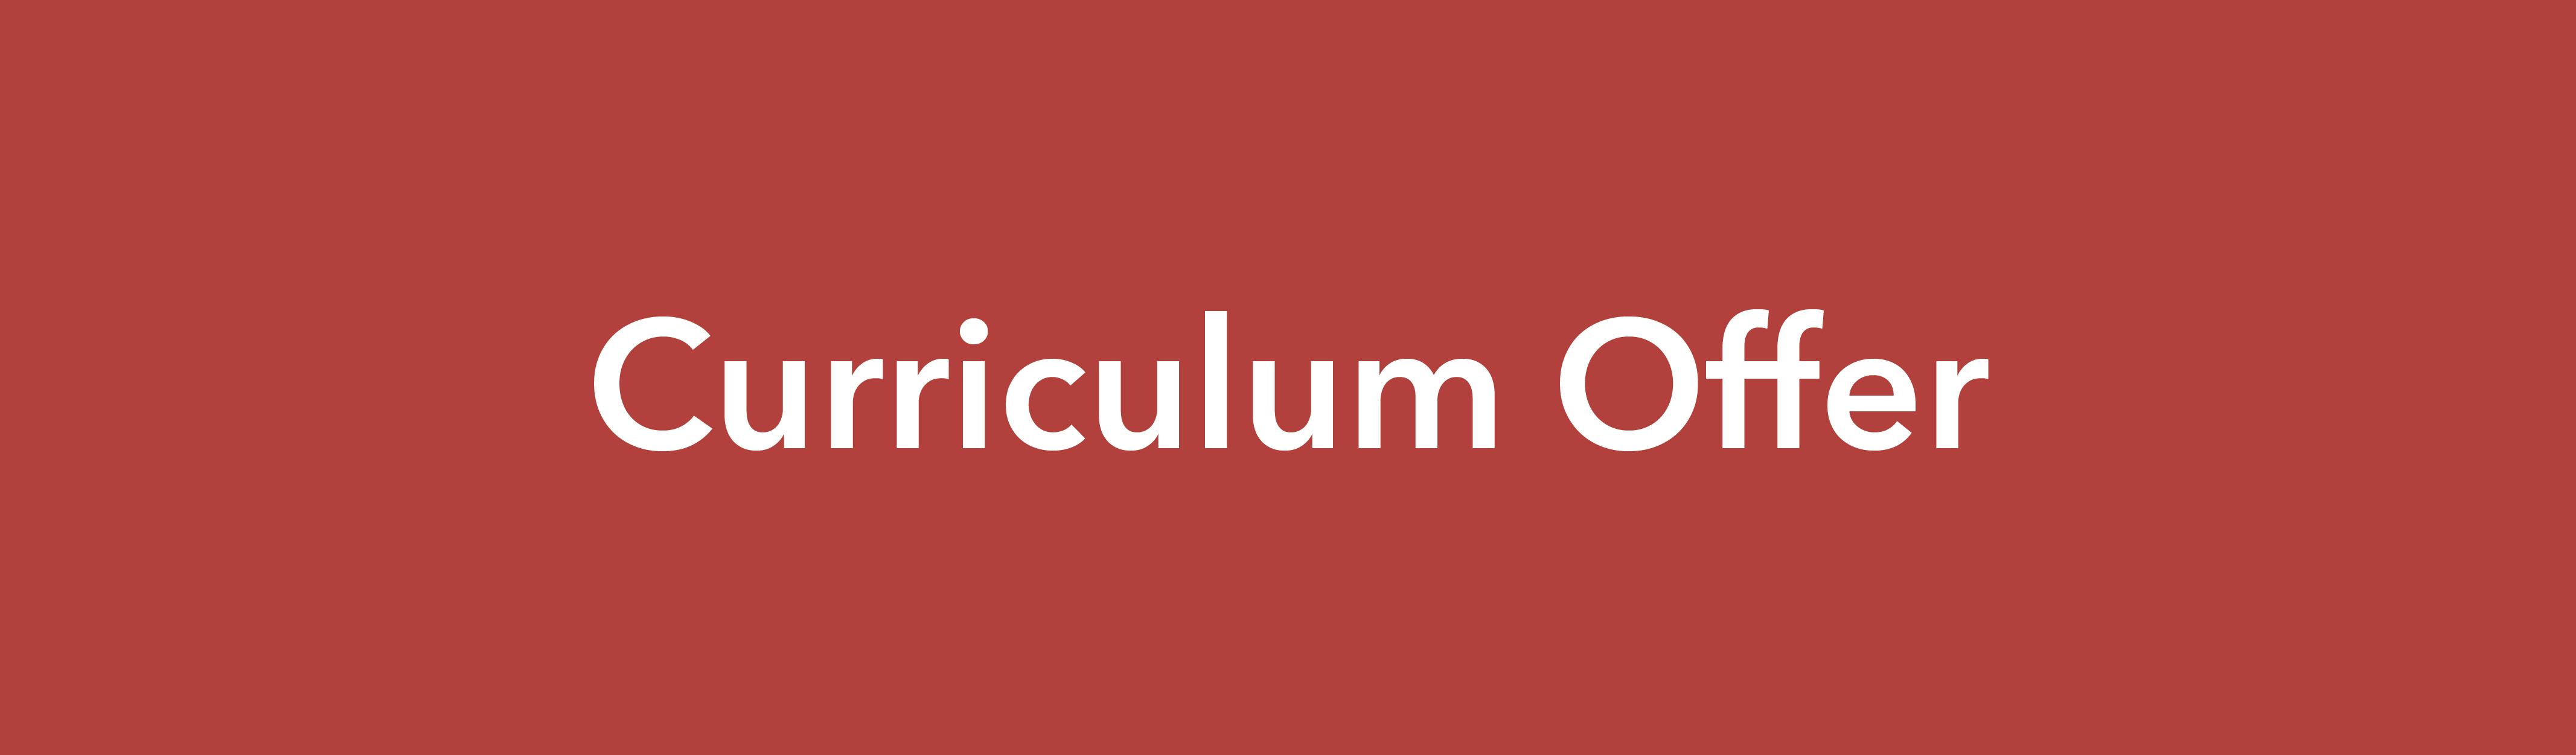 Curriculum Offer